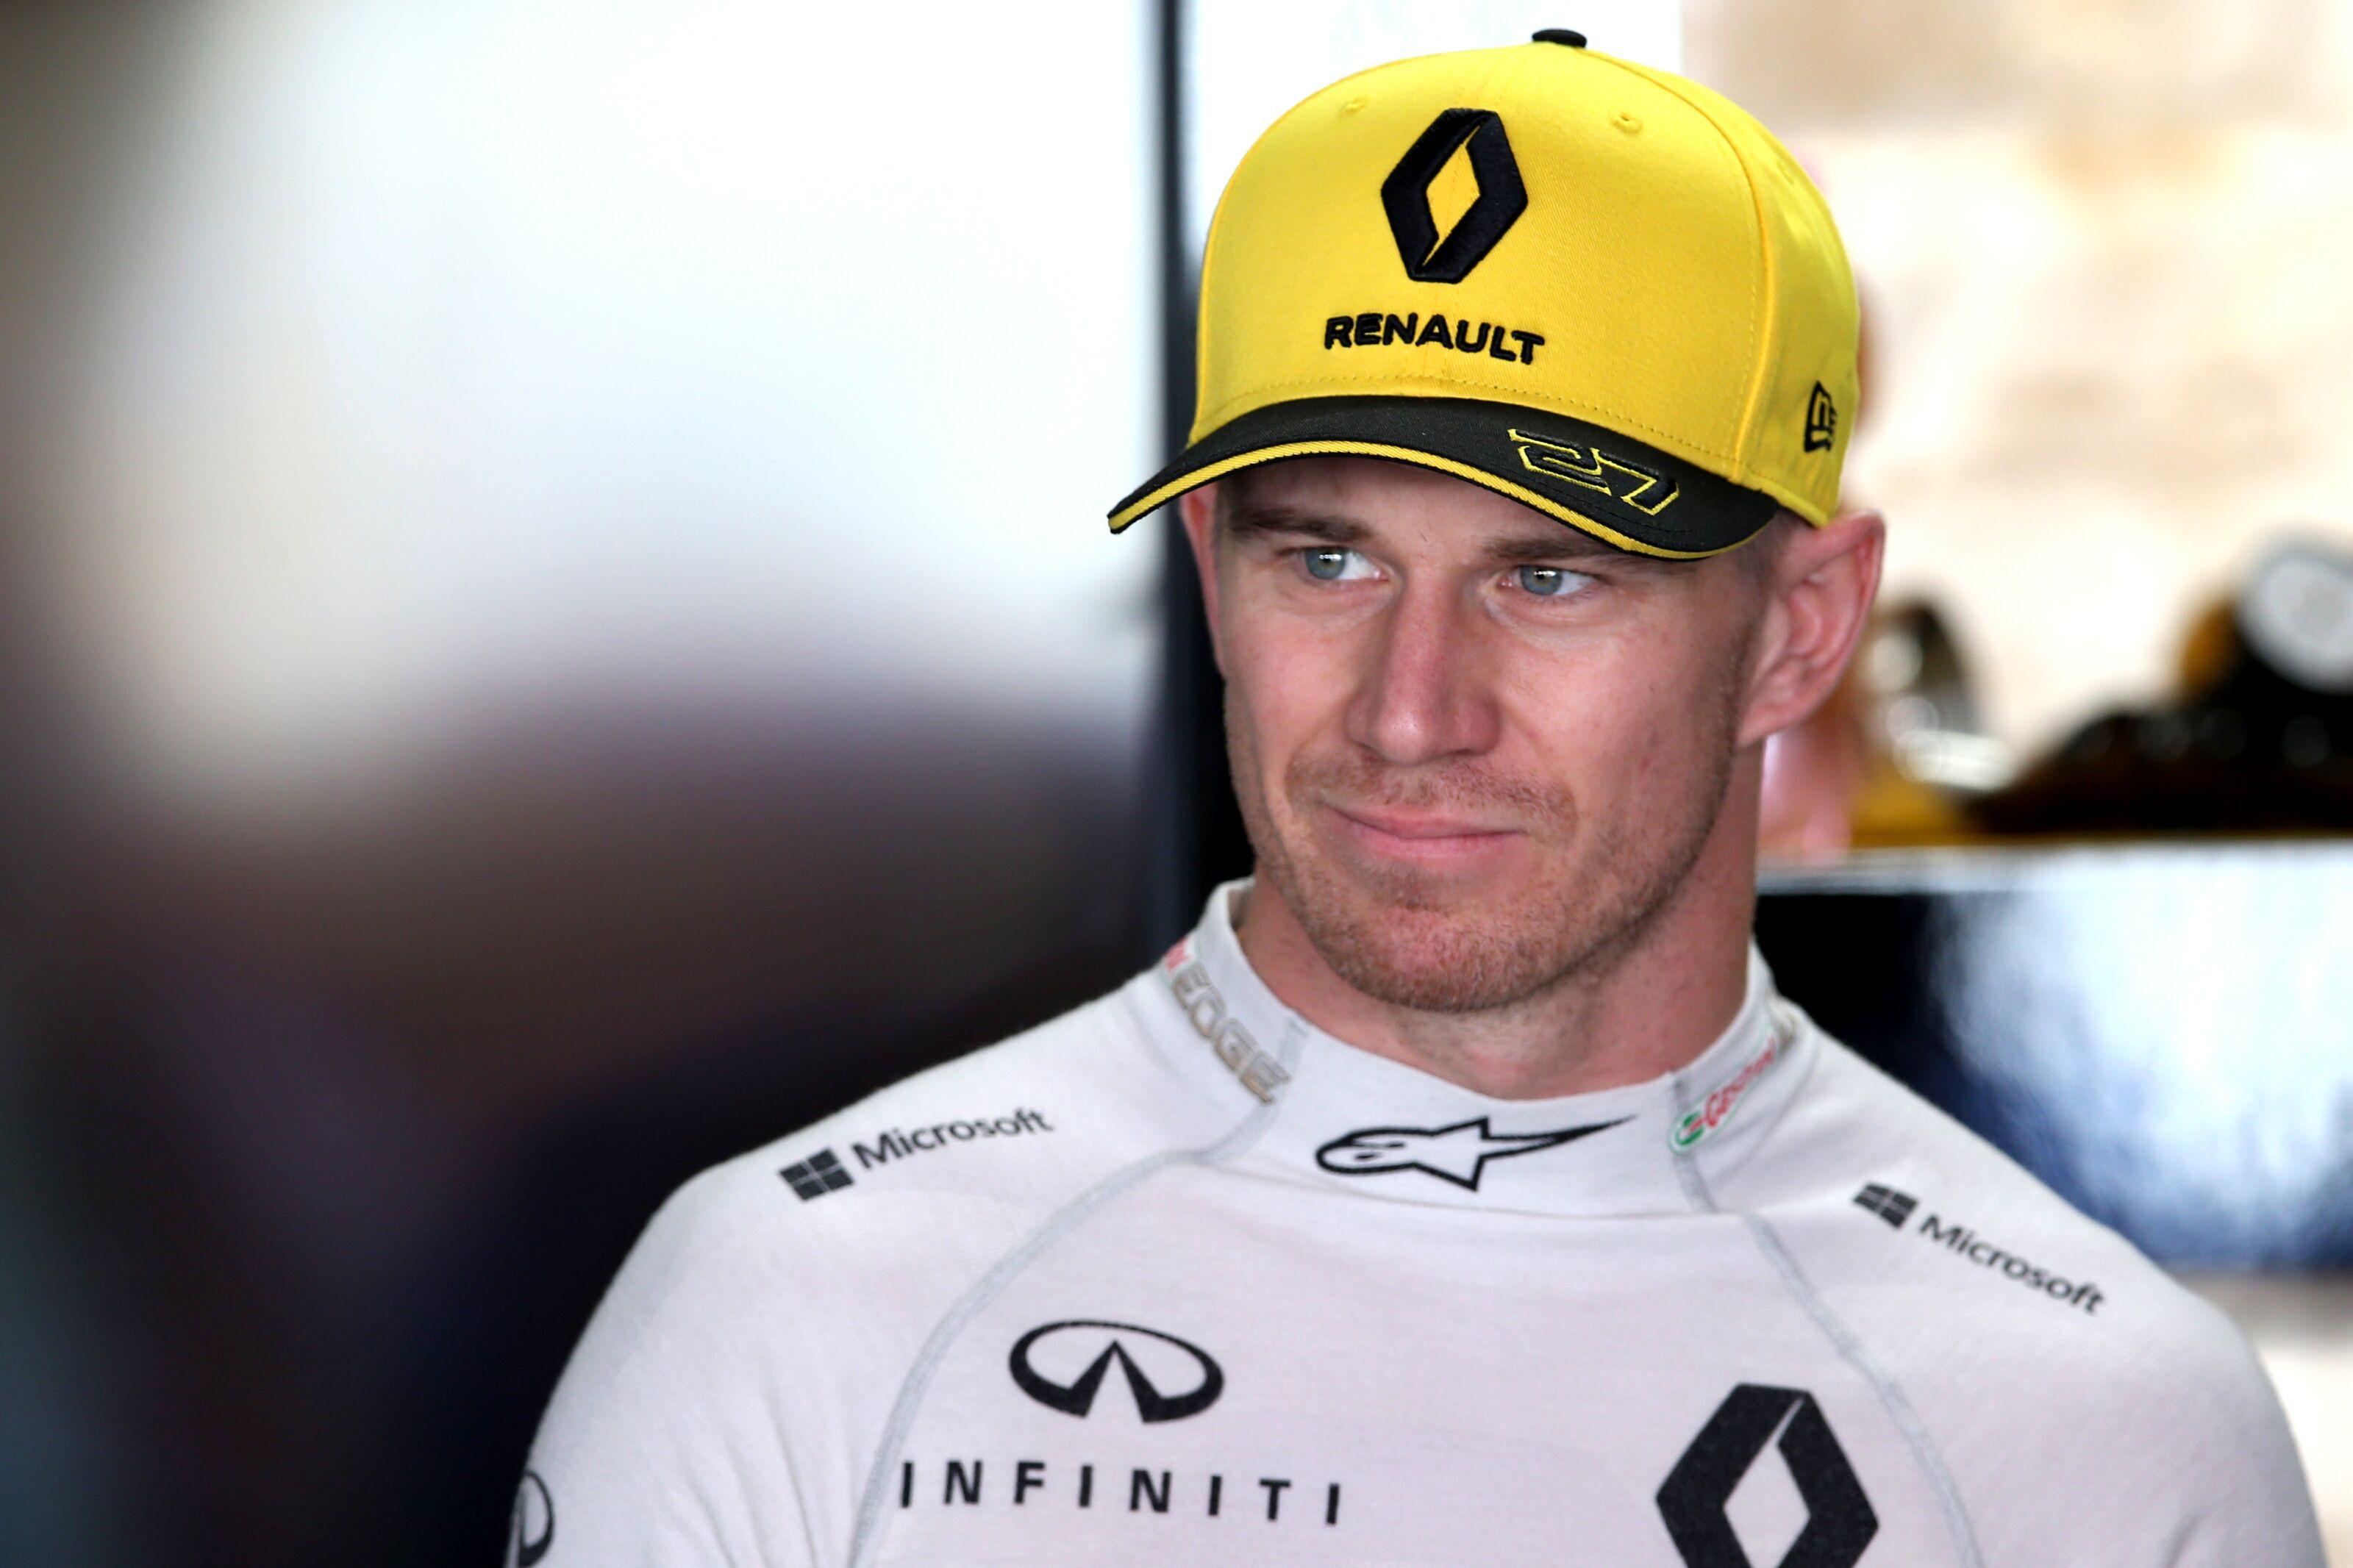 Formula 1: Nico Hulkenberg rumored to replace Romain Grosjean at Haas in 2020